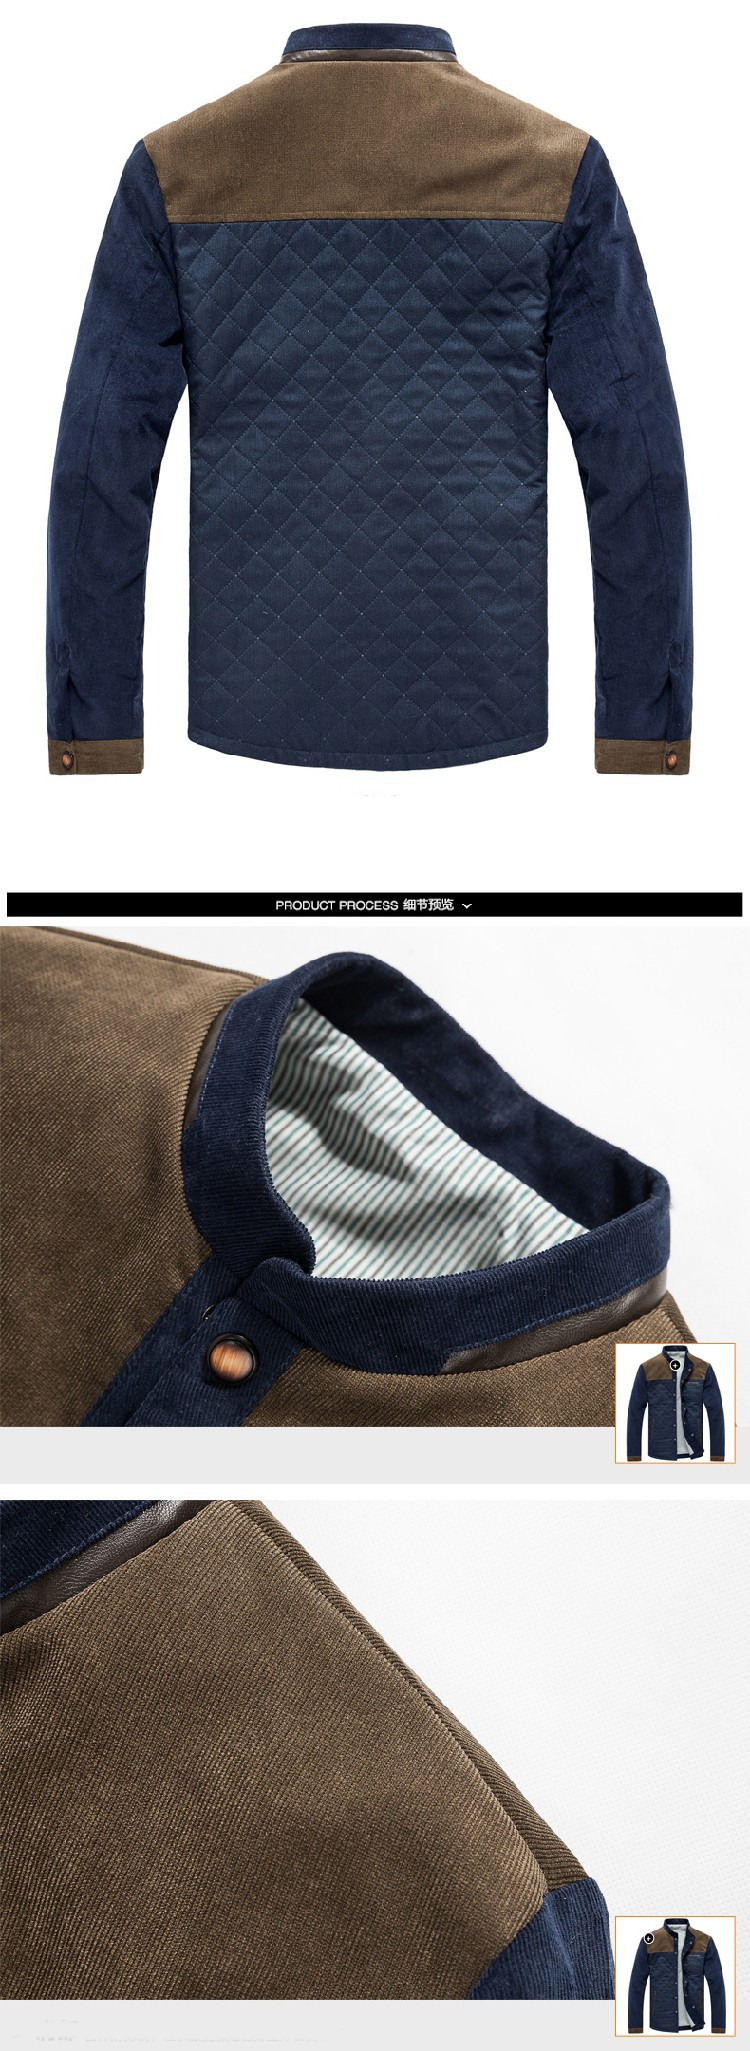 MIACAWOR Original Jacket Men Autumn Jaqueta Masculino Bomber Jacket Casual Chaqueta Hombre Casaco Masculino Drop shipping J100